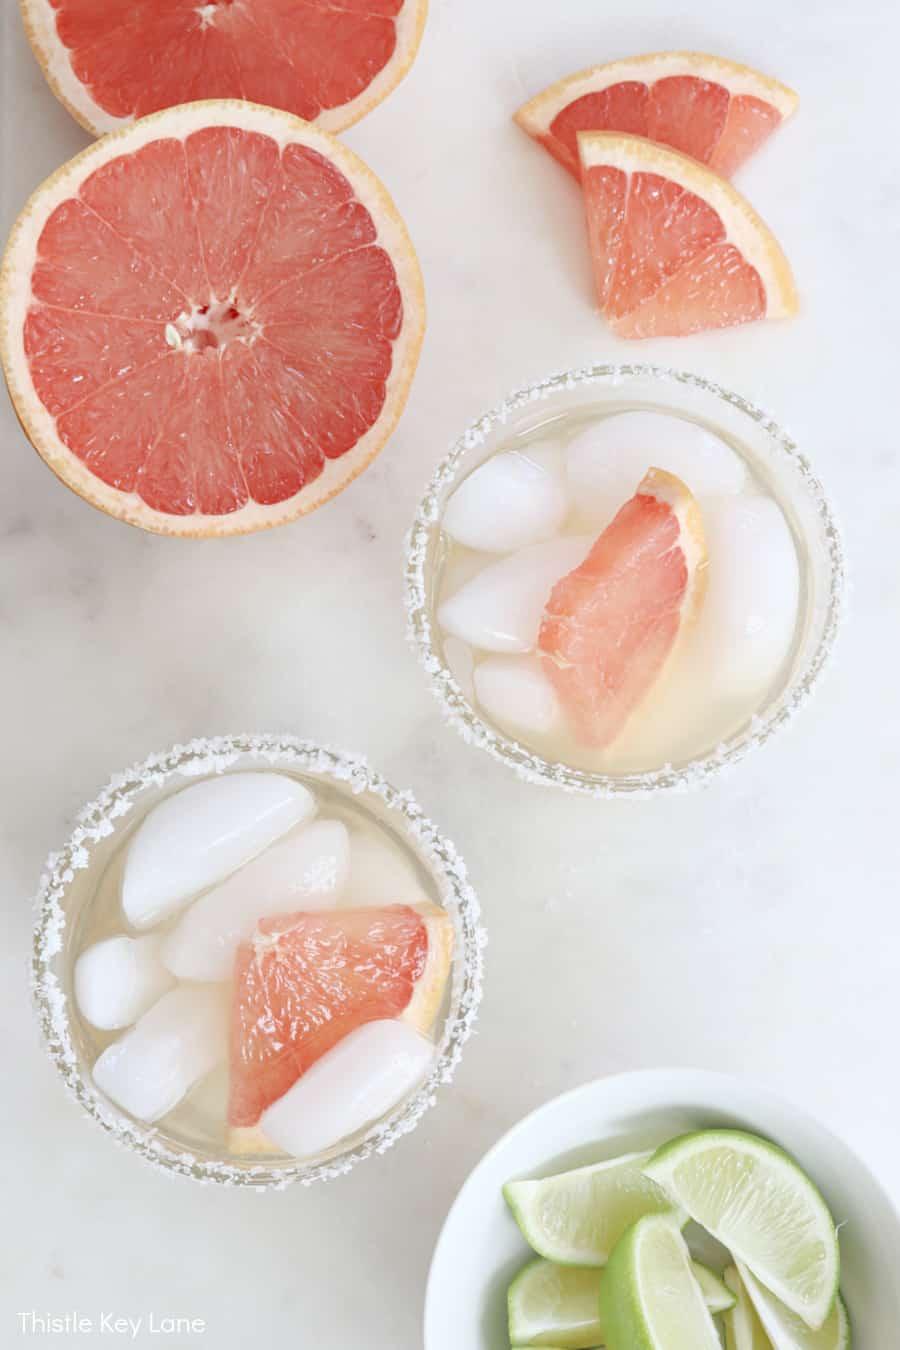 Top view of sliced grapefruit in drinks. Elderflower Grapefruit Margarita Cocktail Recipe.